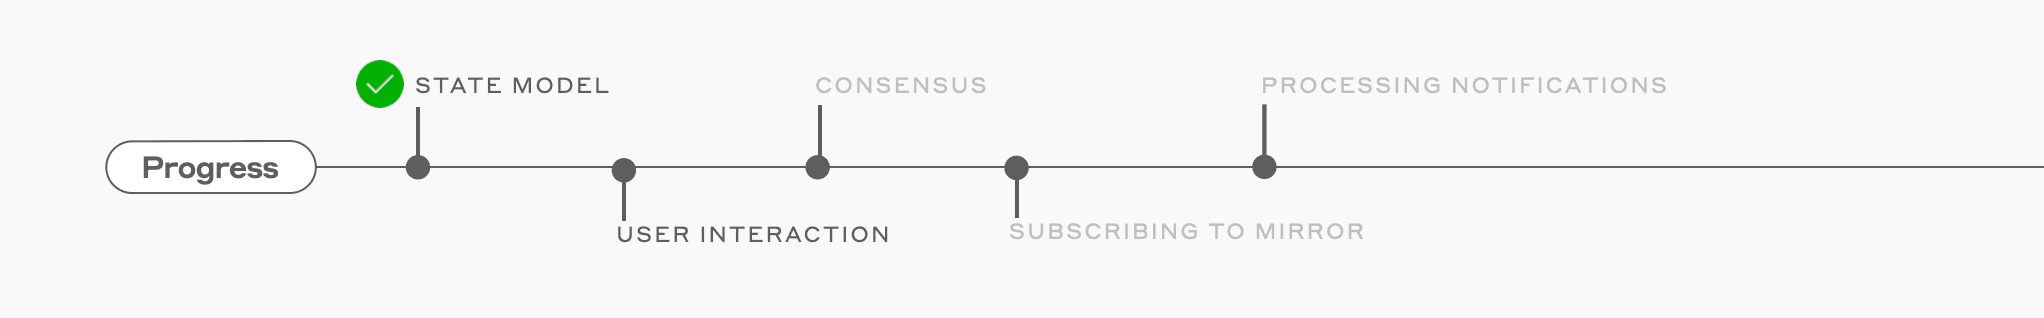 Userinteraction